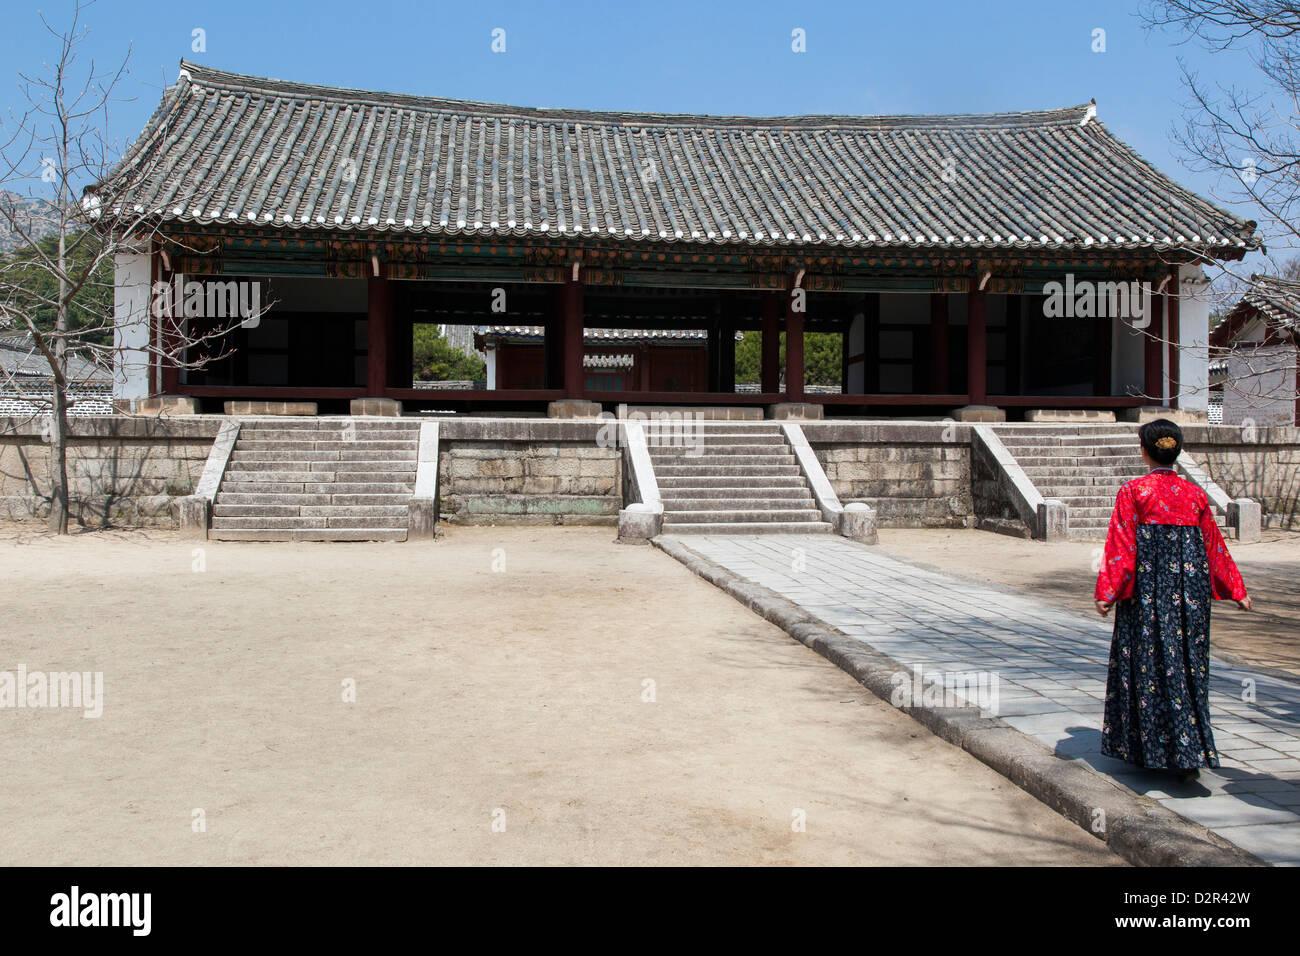 Frau in traditioneller Kleidung König Wang Kon Mausoleum, Stadt Kaesong, Nordkorea Stockbild